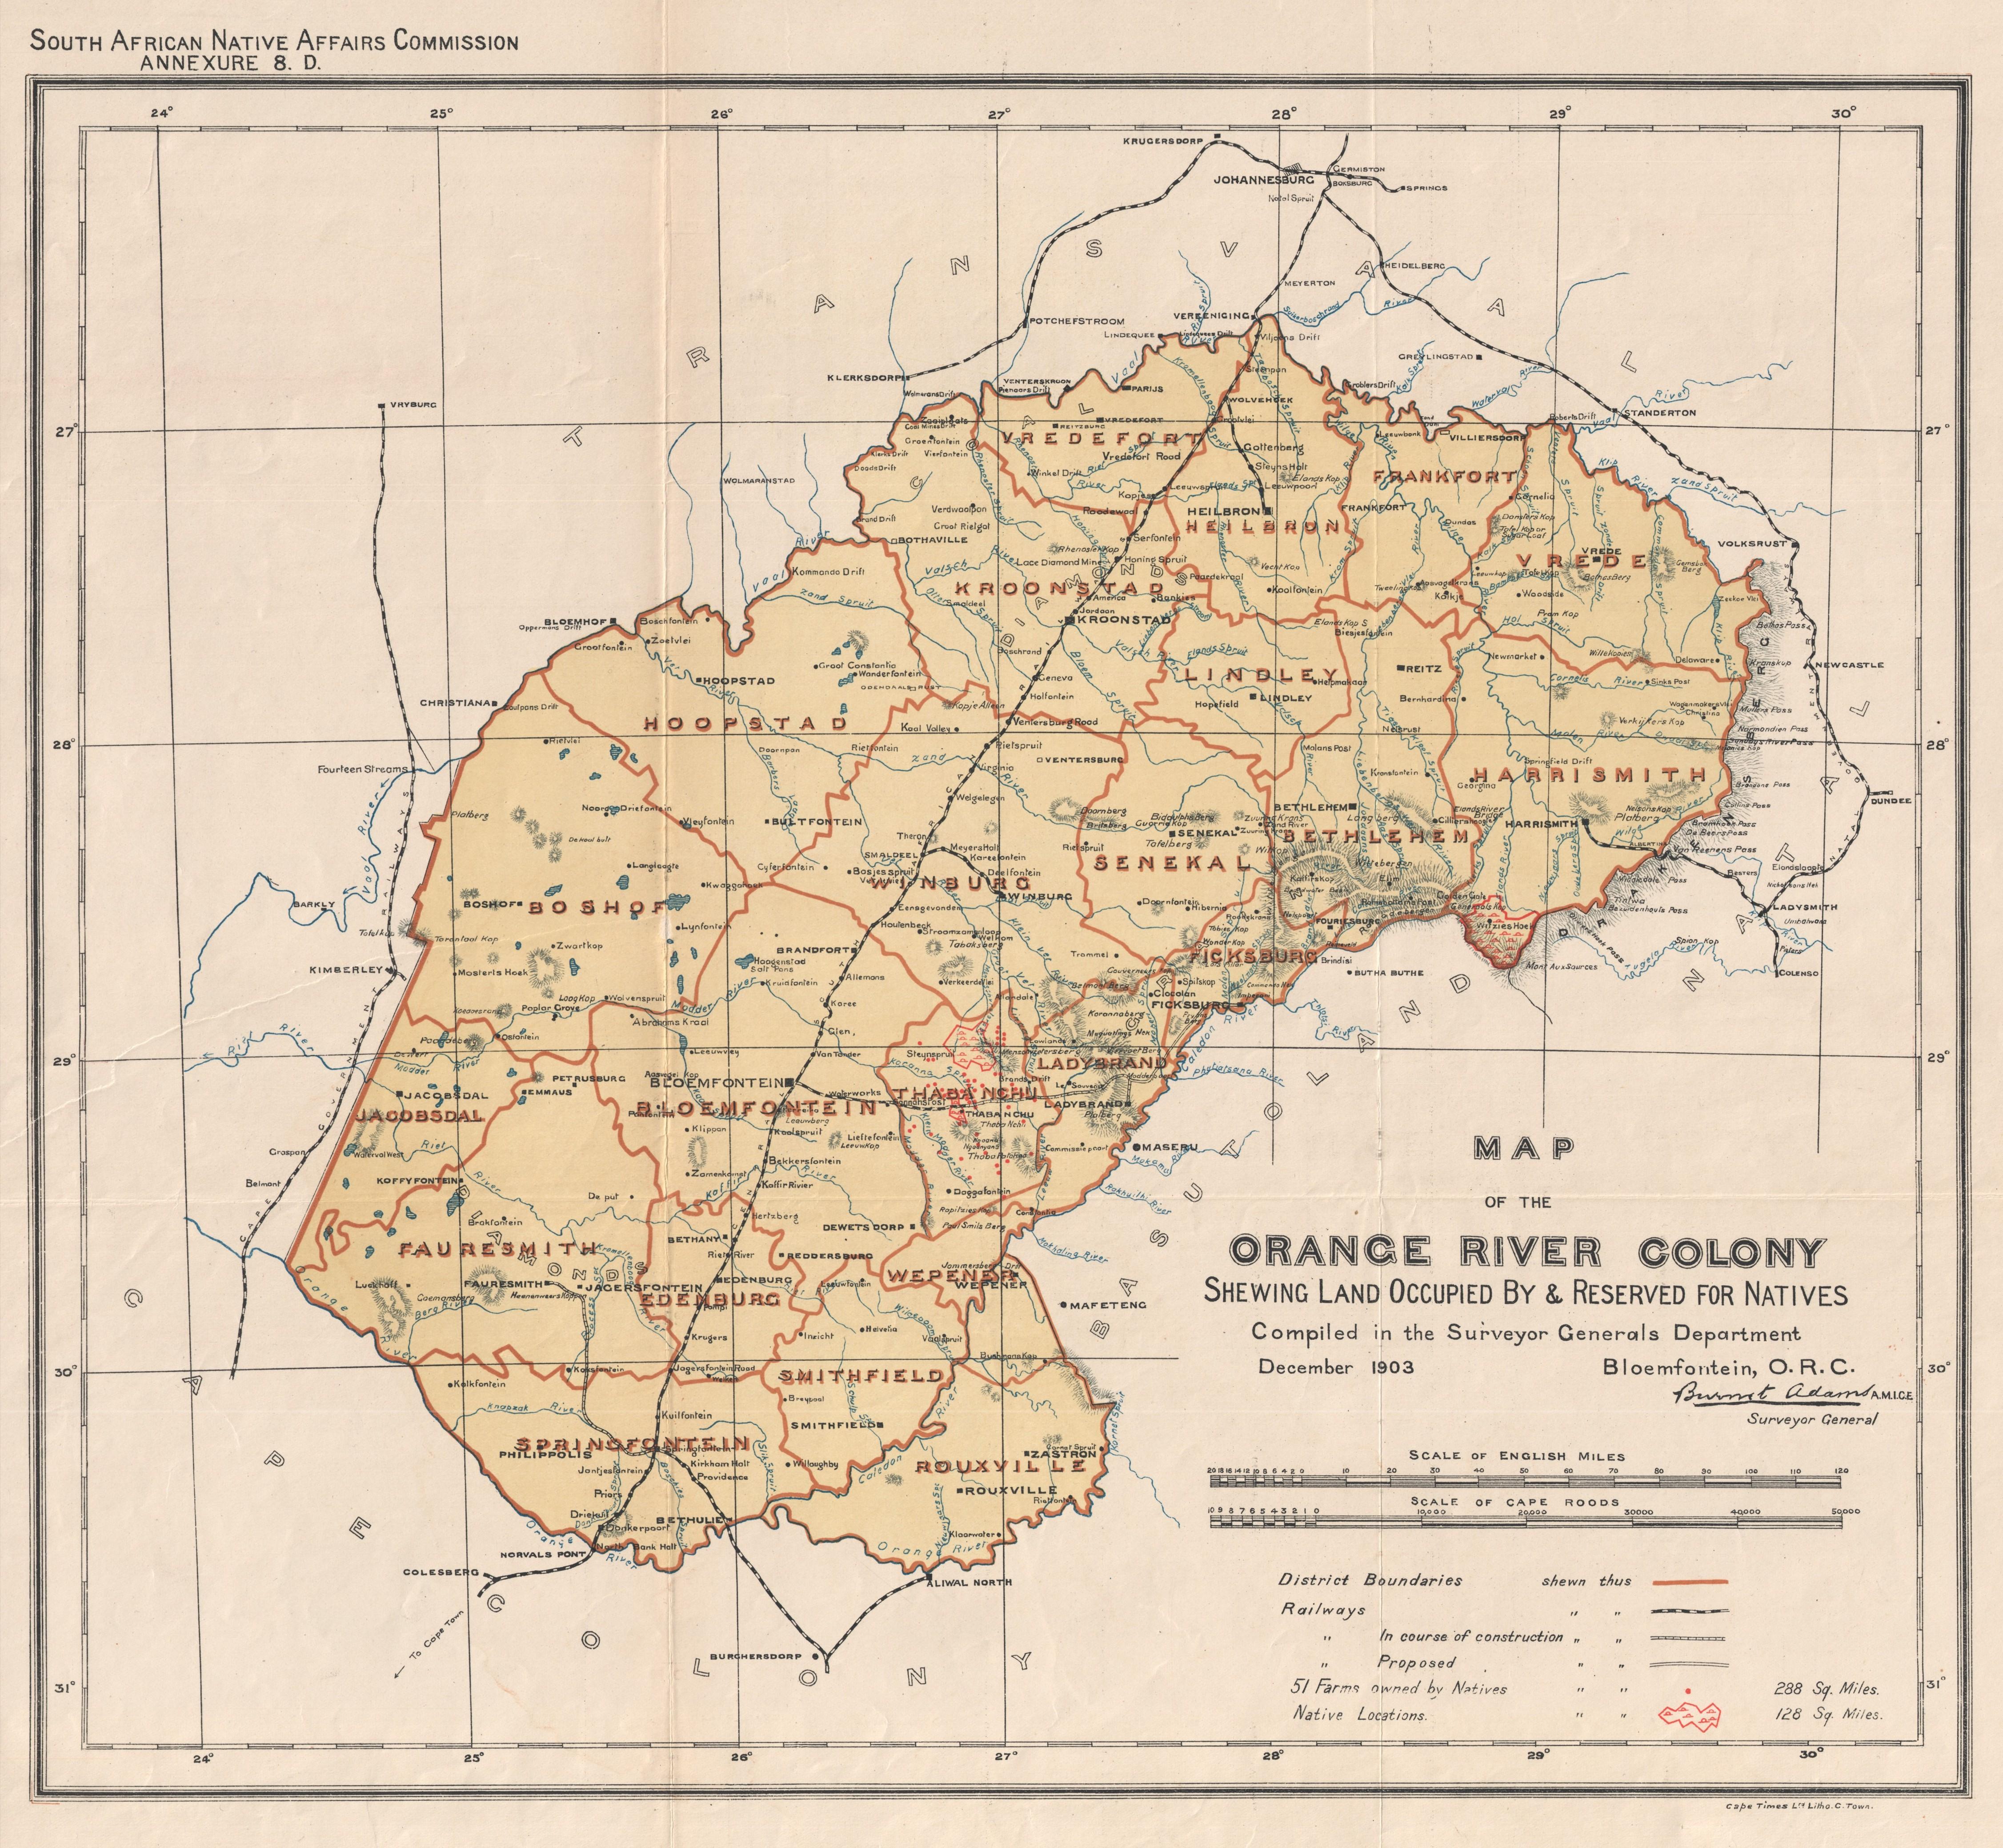 Map of Orange River Colony, 1903